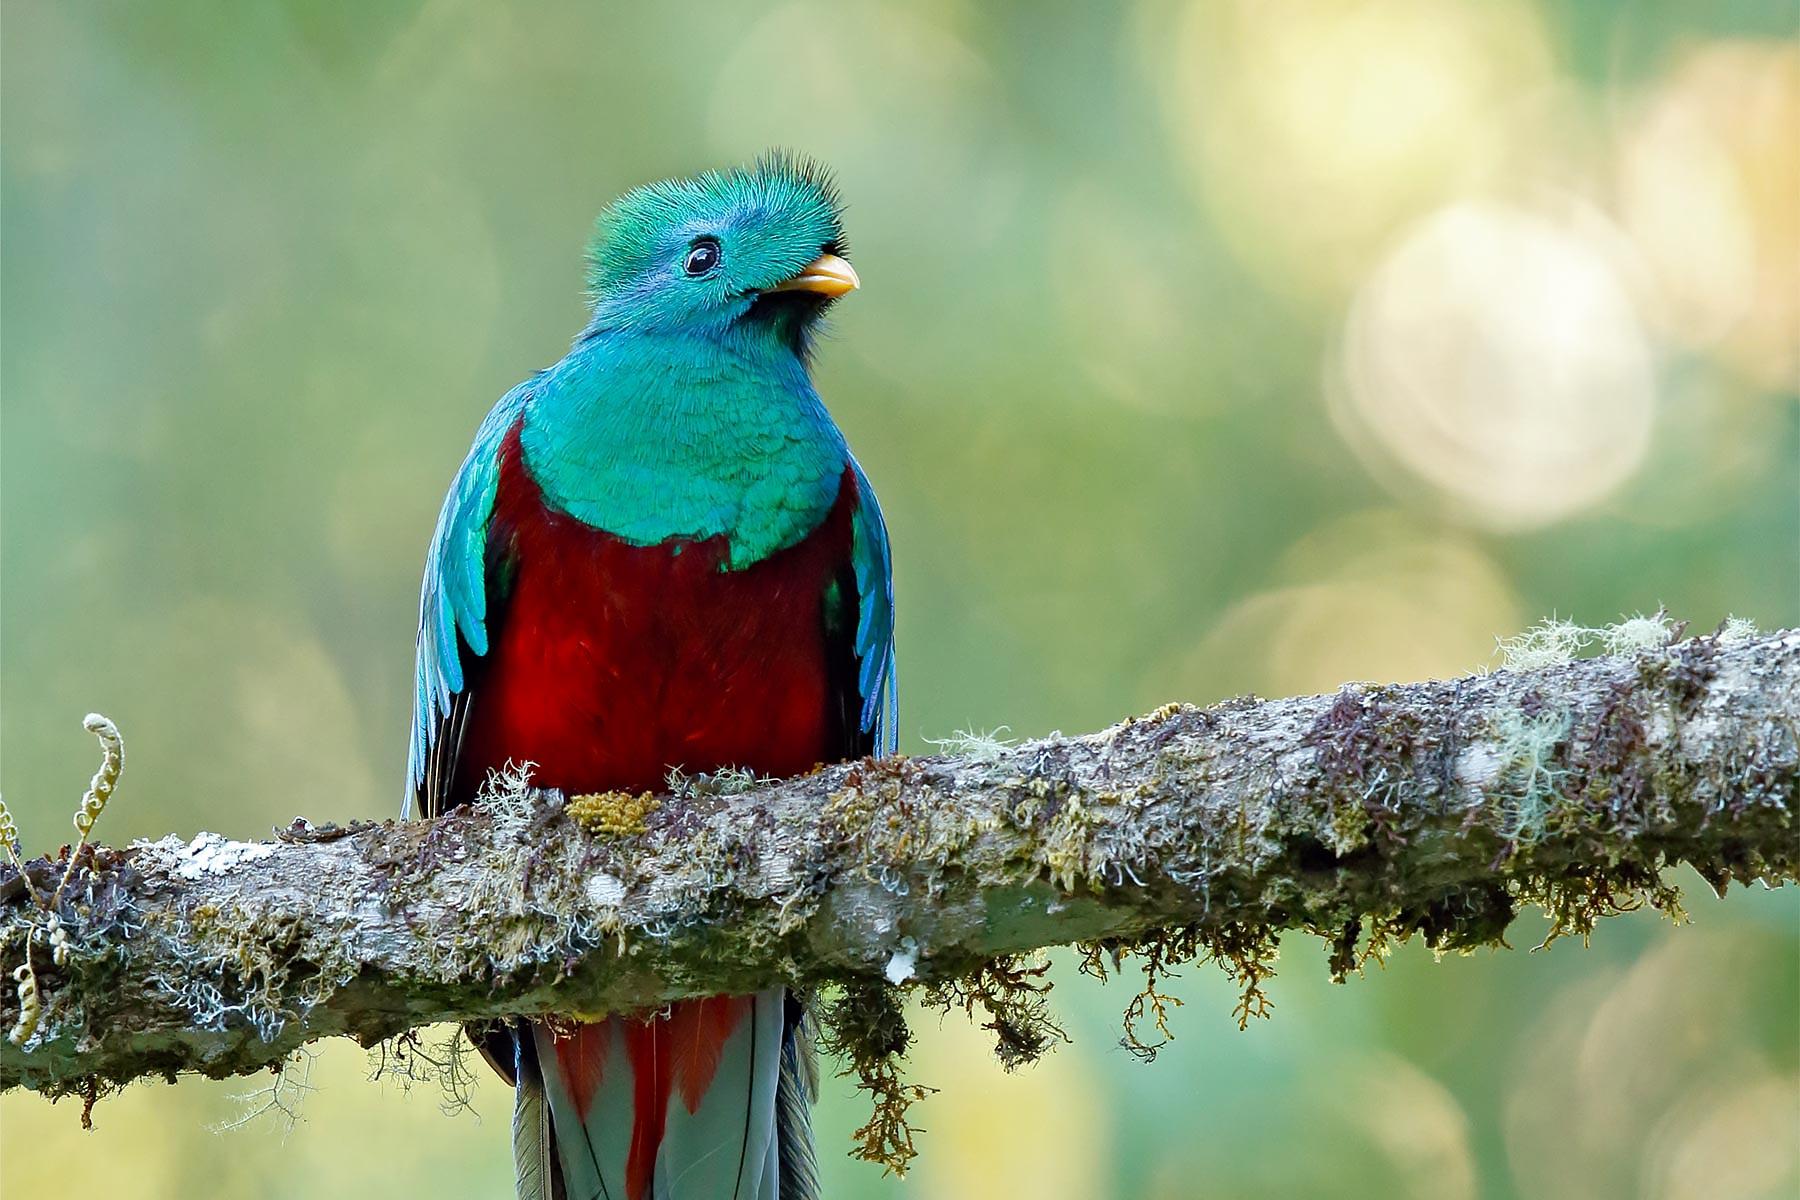 Resplendent Quetzal @ Costa Rica